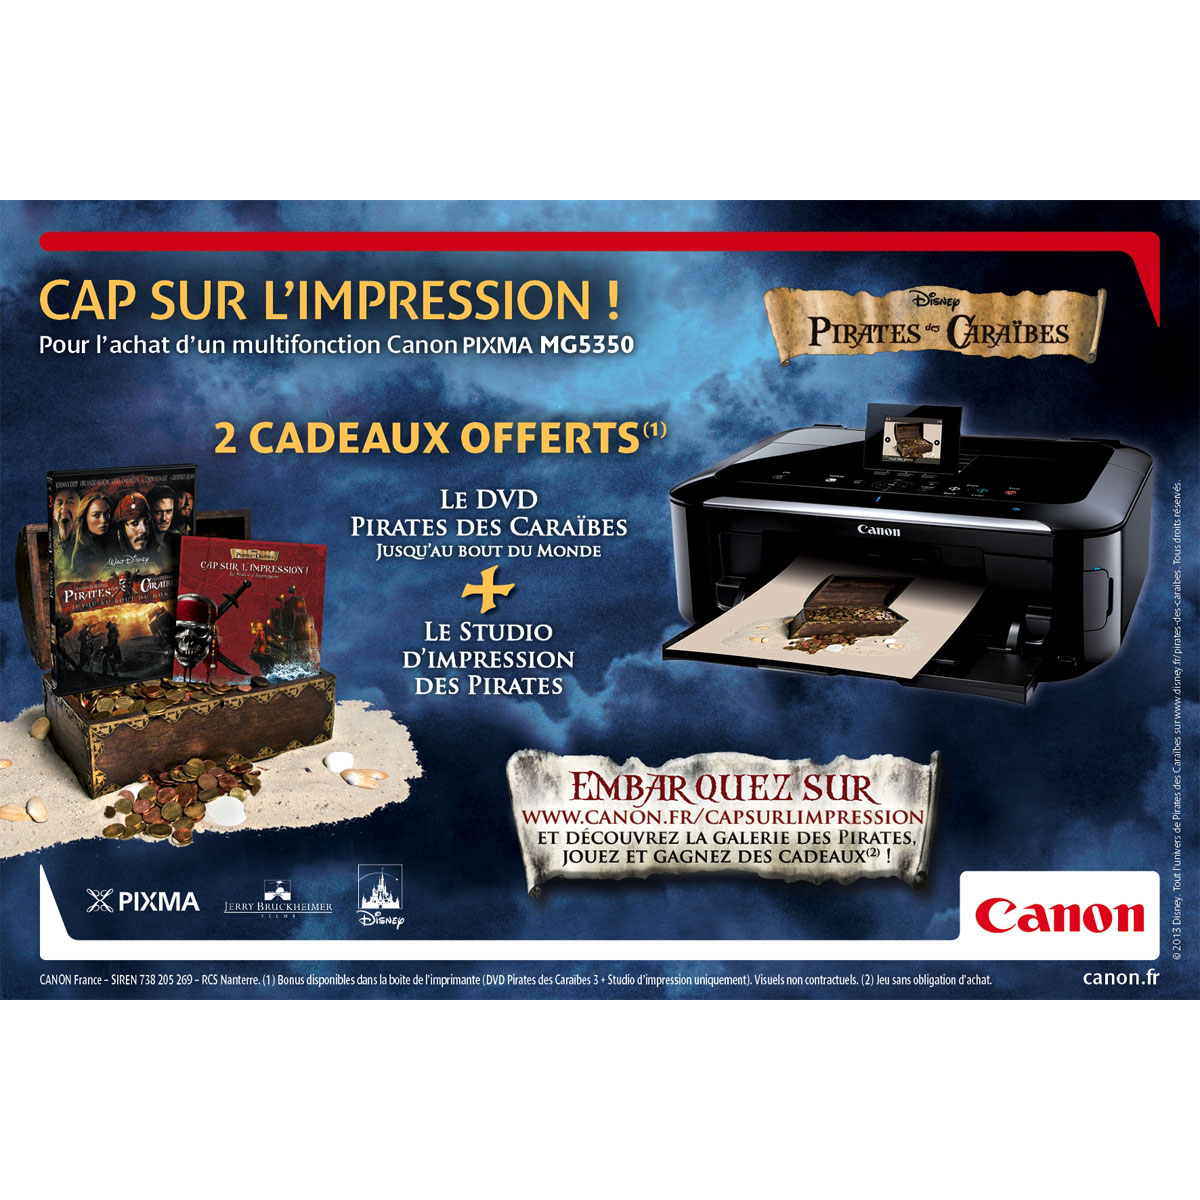 canon pixma mg5350 pirates des cara bes imprimante. Black Bedroom Furniture Sets. Home Design Ideas